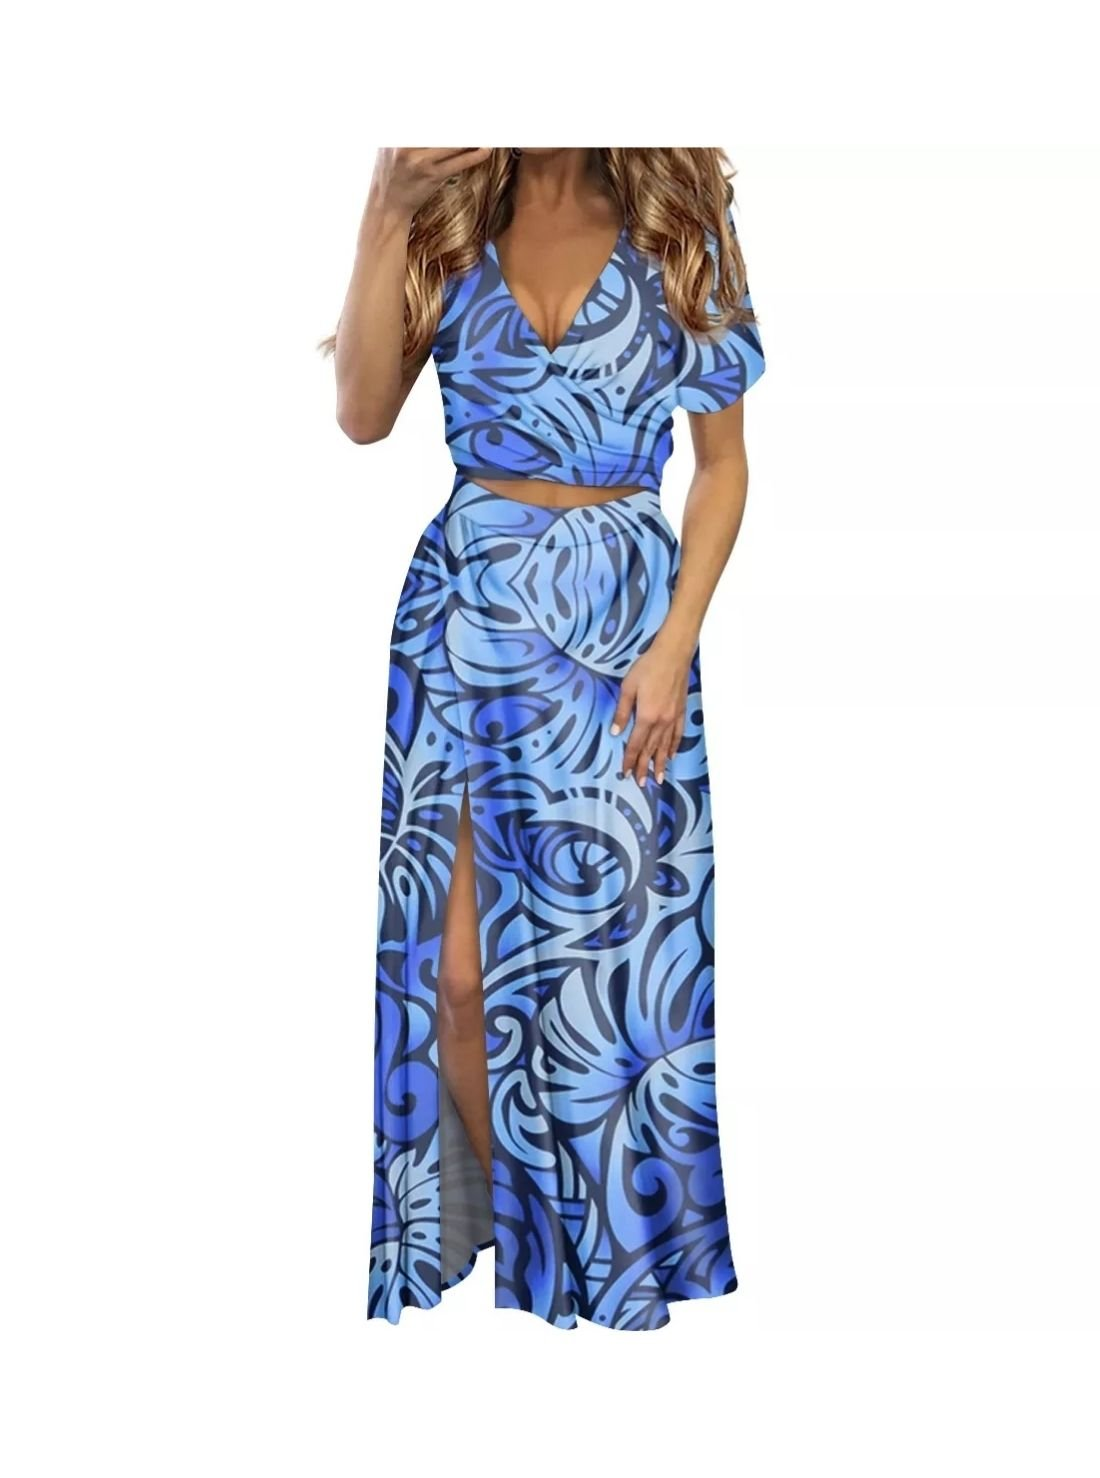 Wholesale Women's Christmas Wrap V-neck Dress